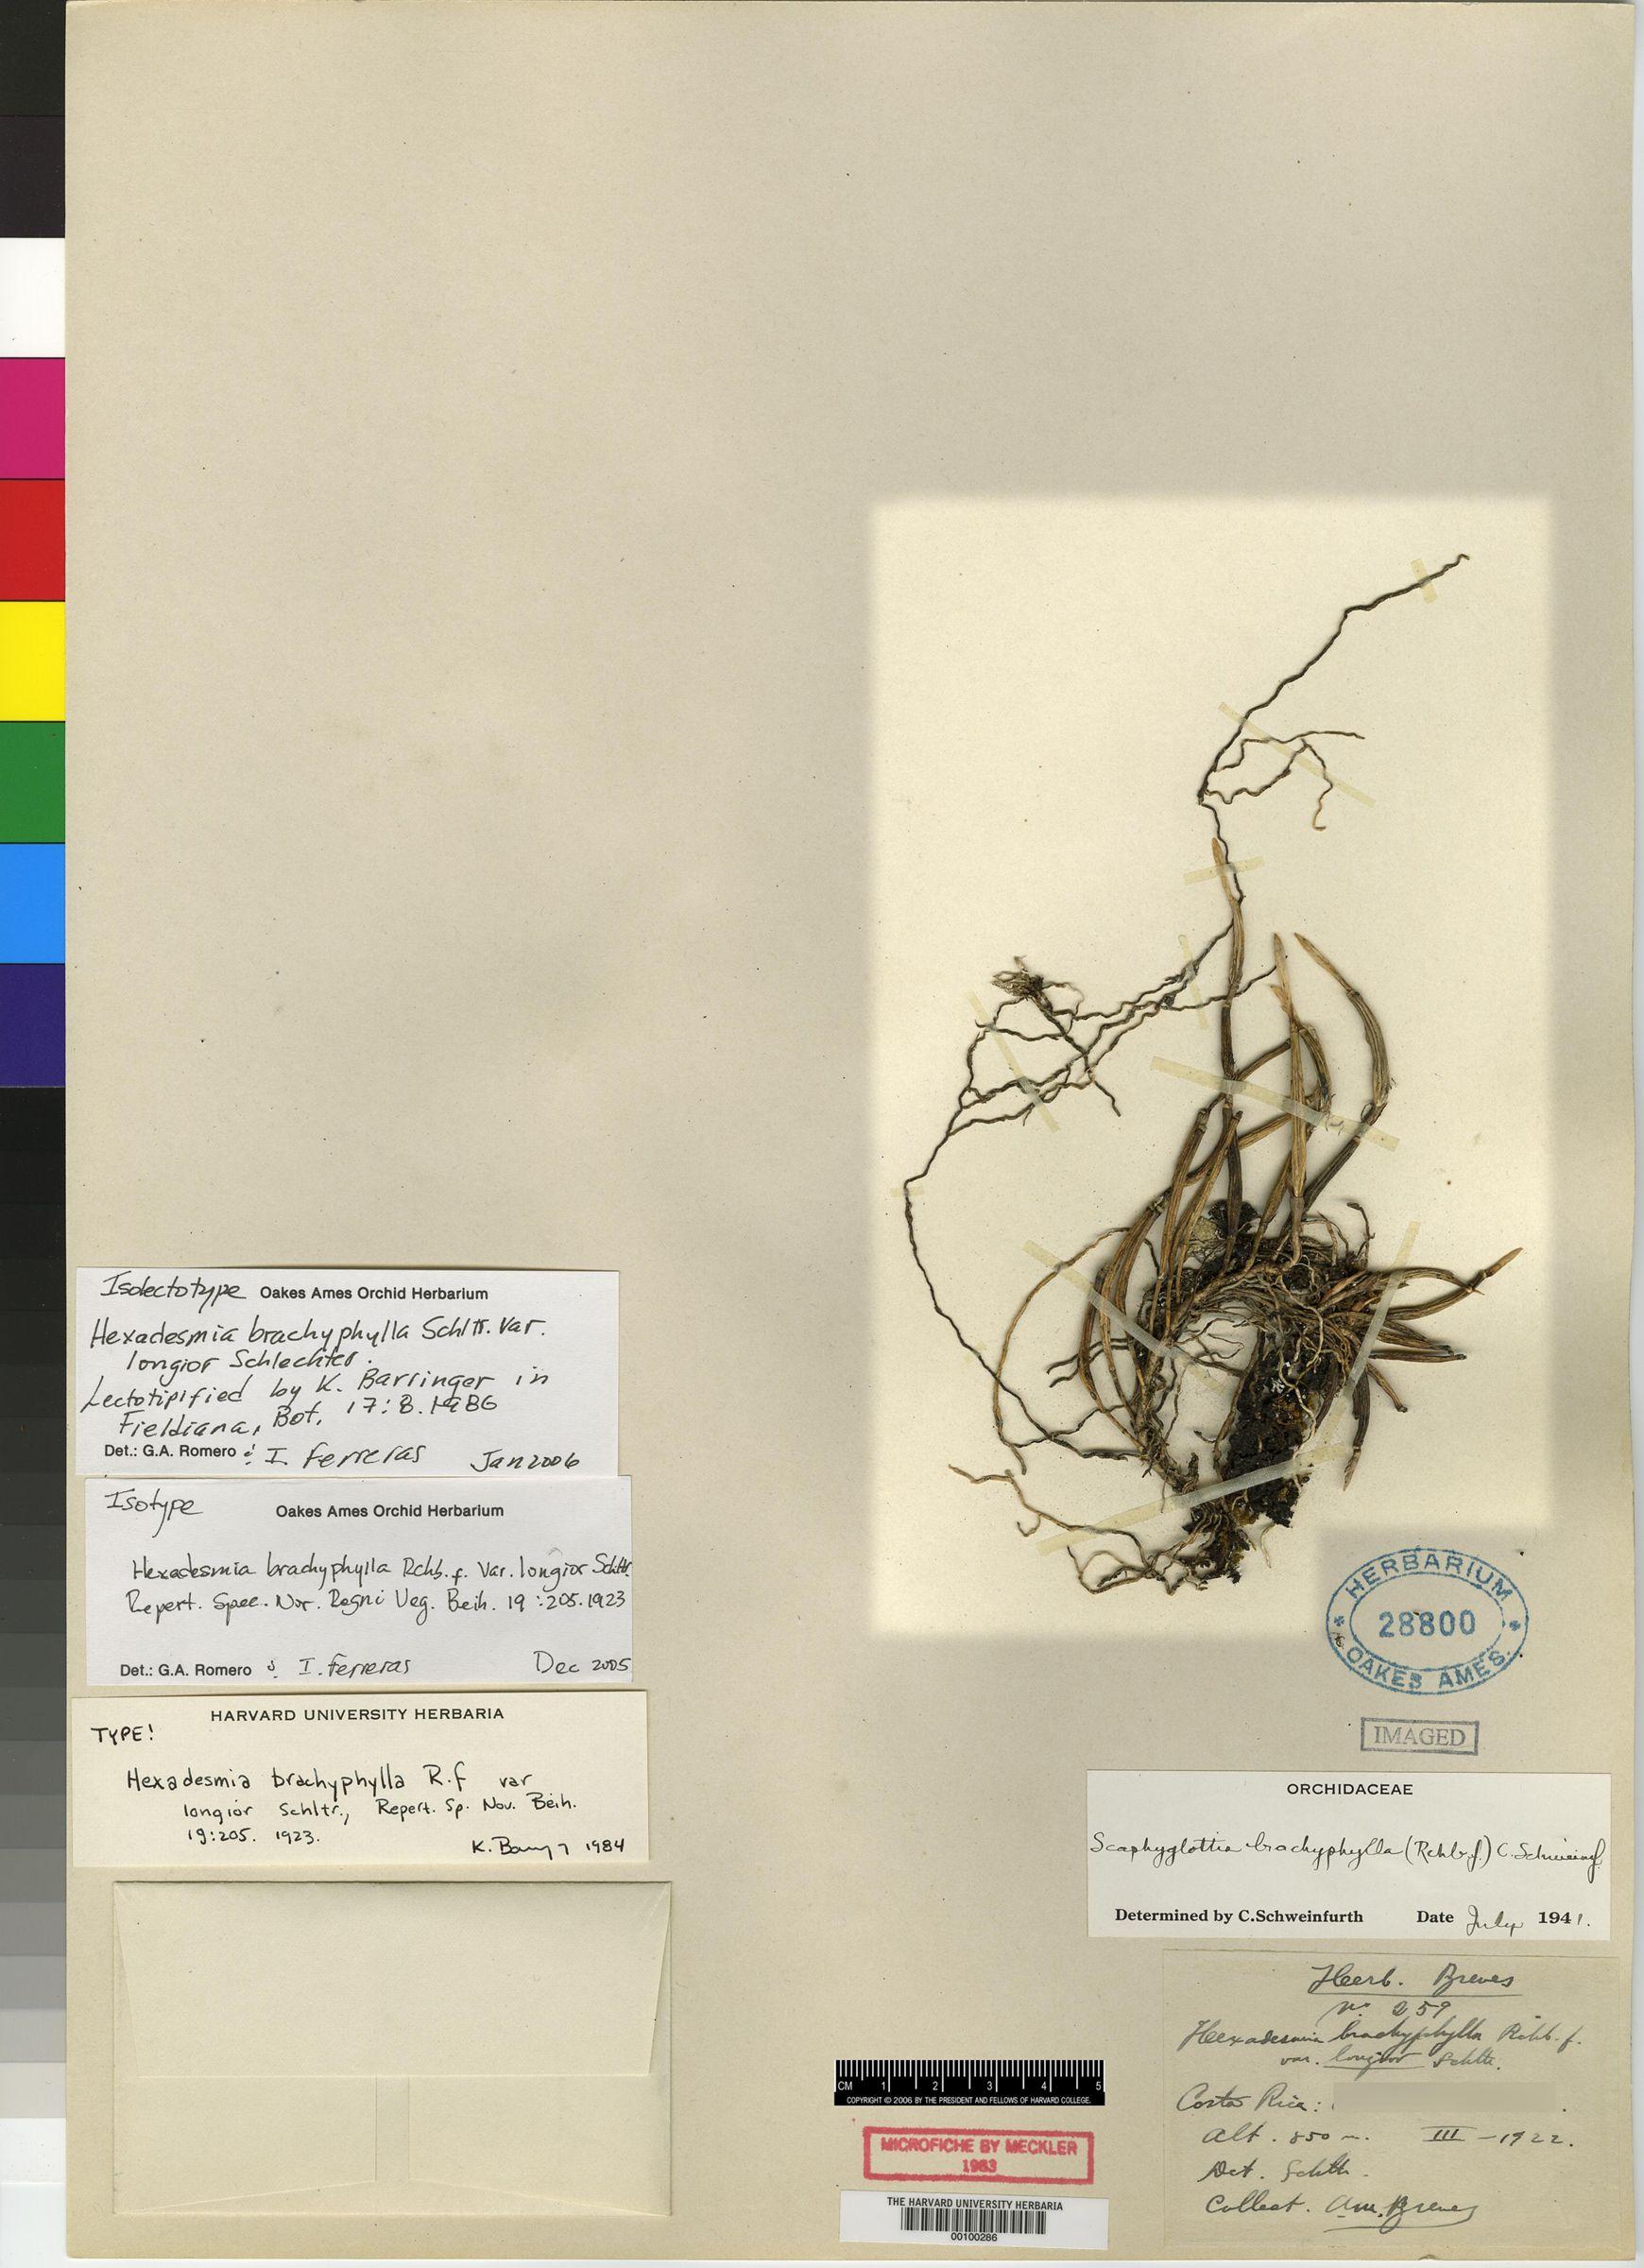 Scaphyglottis fusiformis image